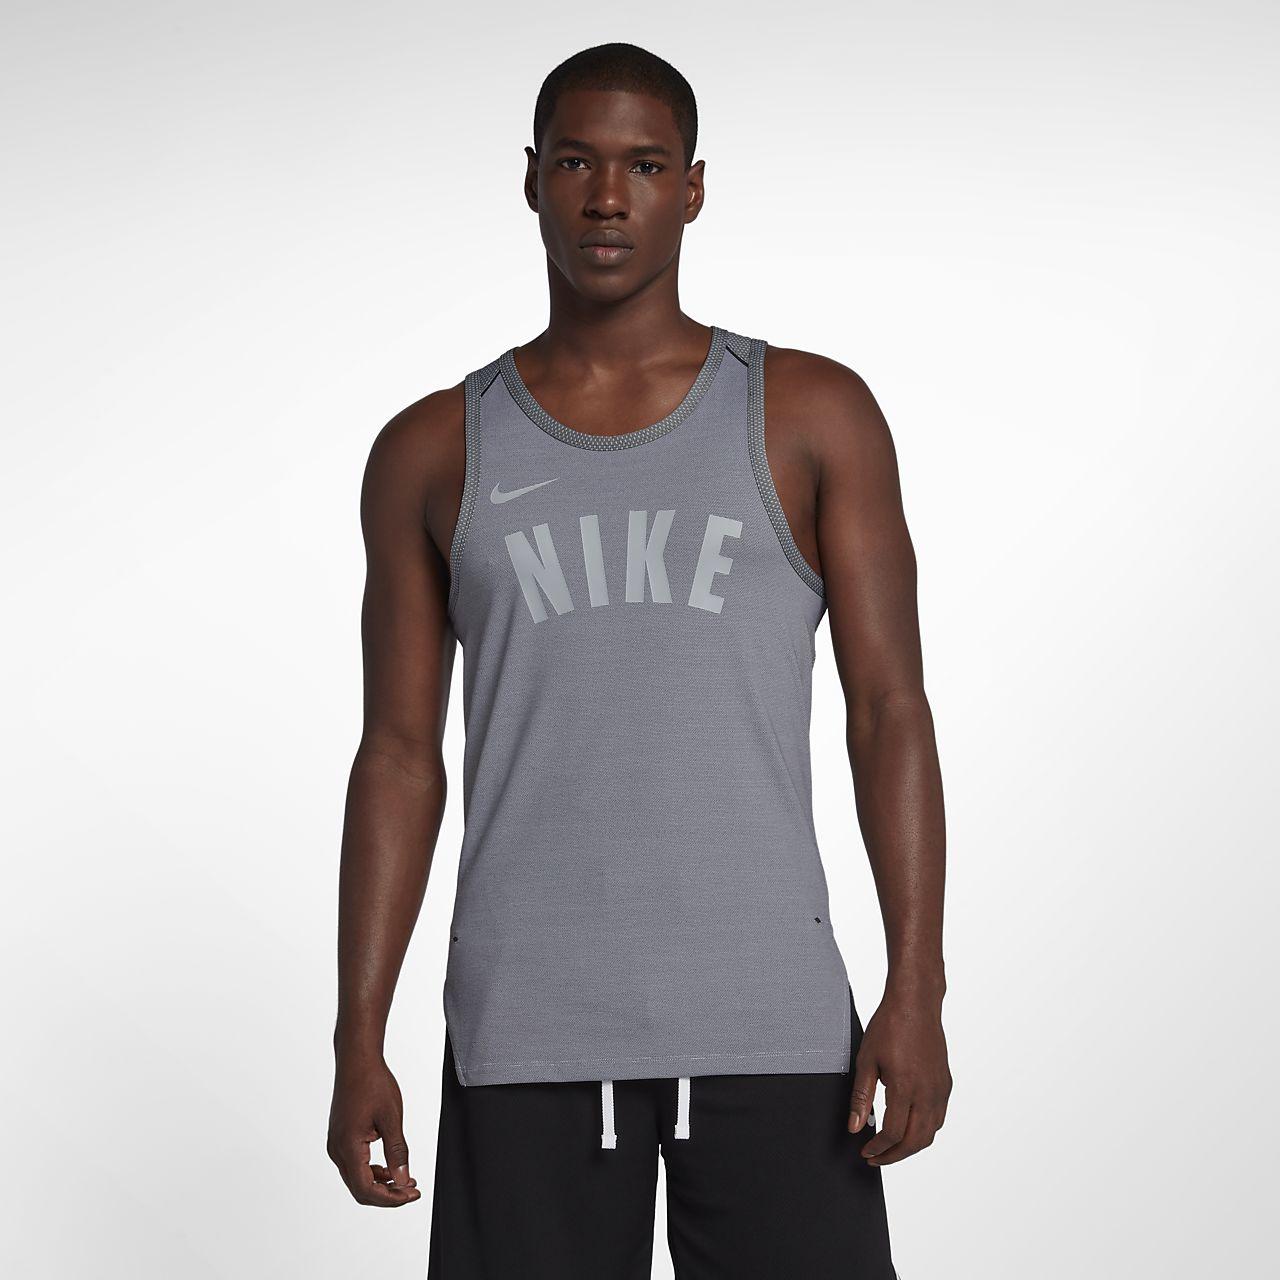 Sin Fit Mangas Hyper Dri Hombre Para Nike Elite De Básquetbol Top qHBFPF